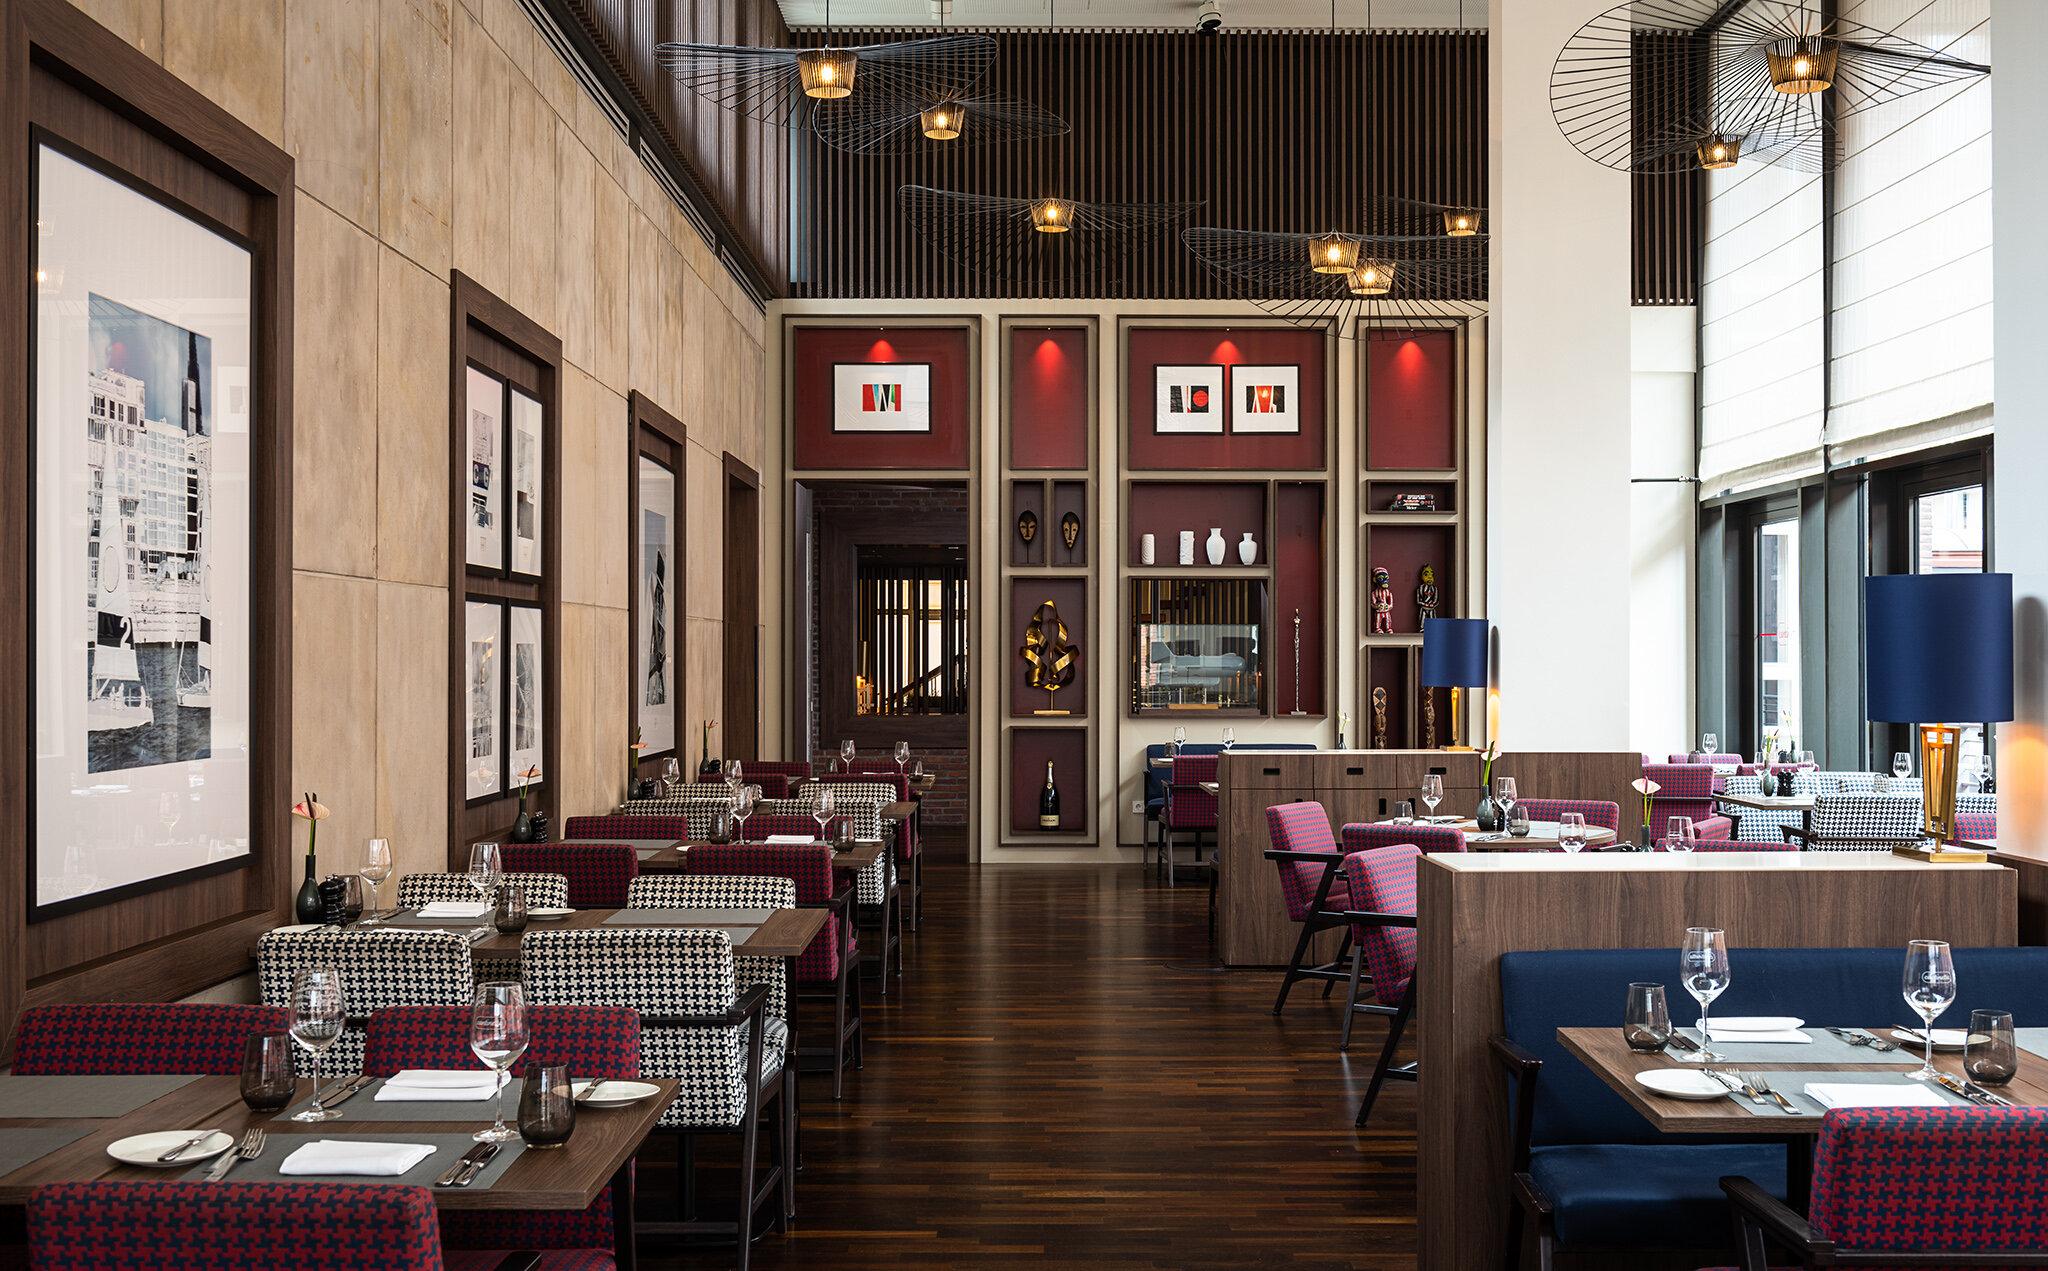 cantinetta ristorante bar ameron hotels. Black Bedroom Furniture Sets. Home Design Ideas